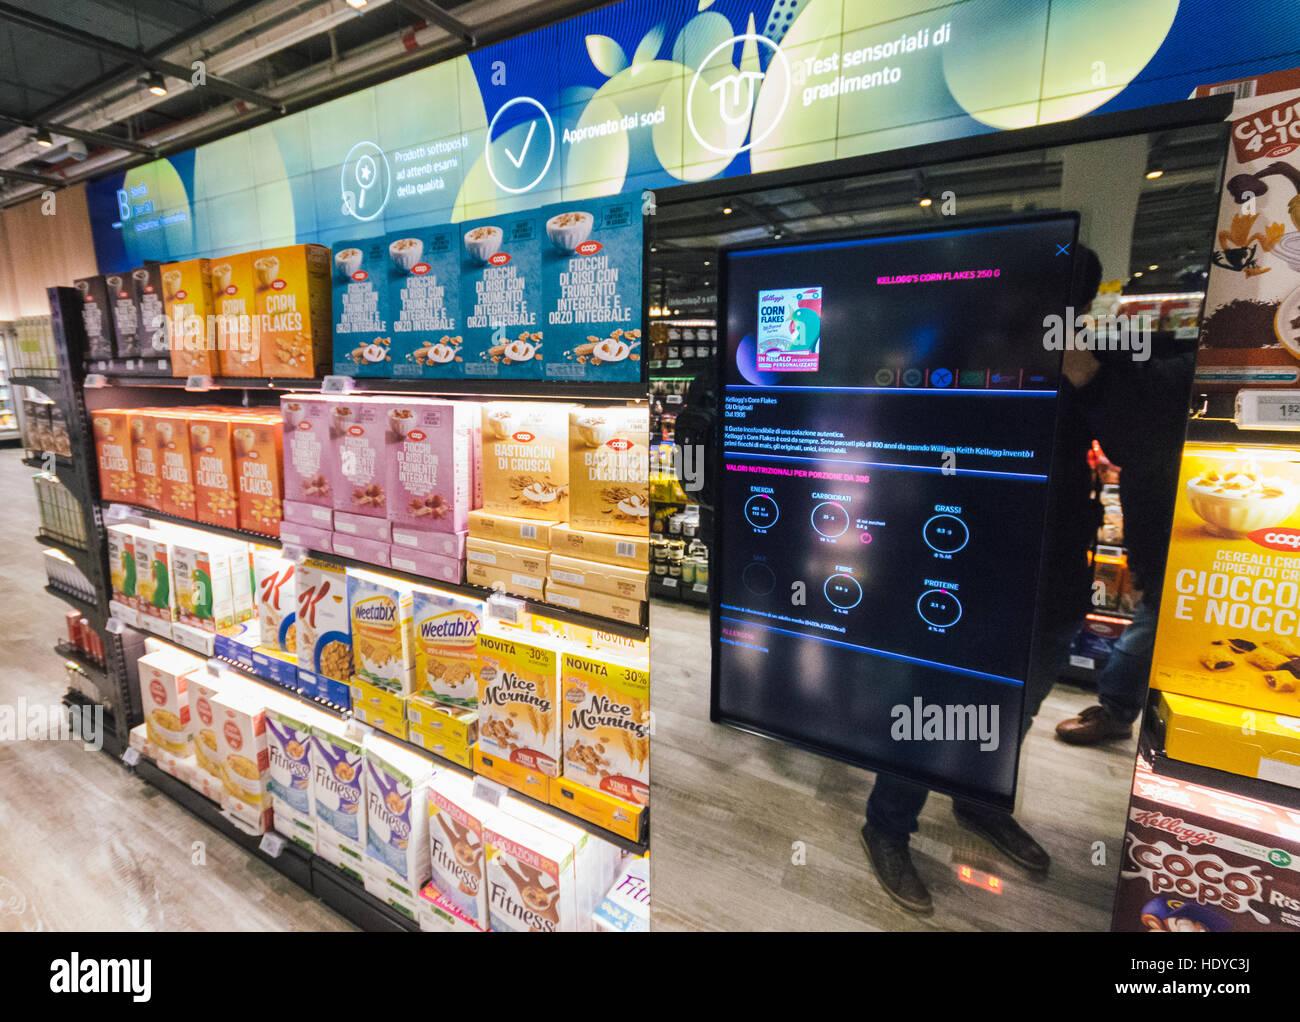 innovative design 853f5 956f2 Coop Italia, Italy's largest supermarket chain, has ...